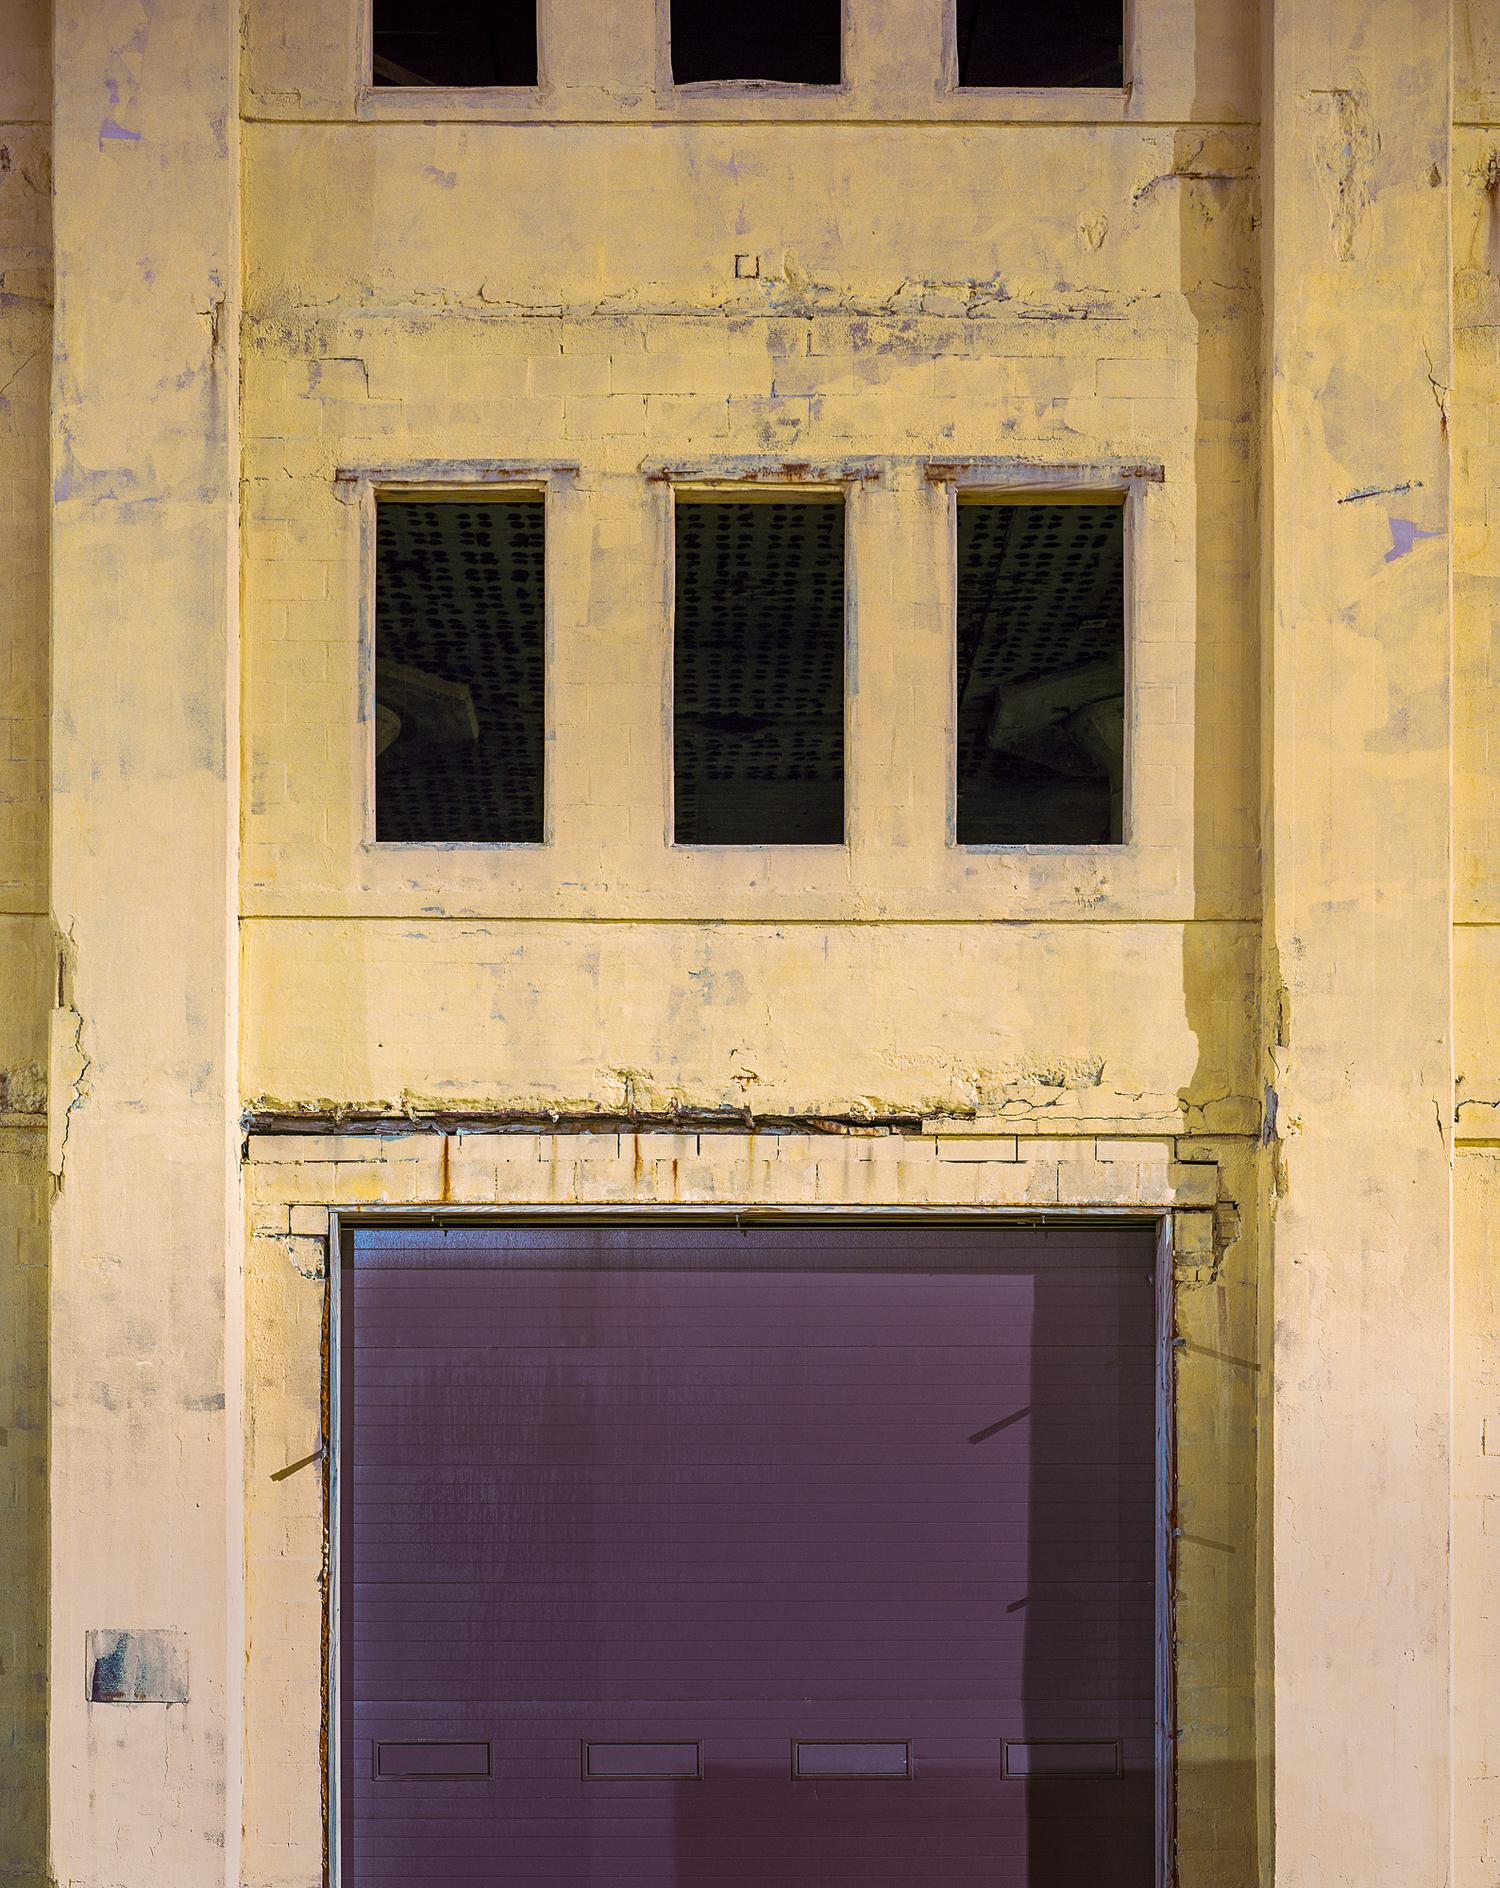 Brick_and_glass-Paul_Puiia-6.jpg